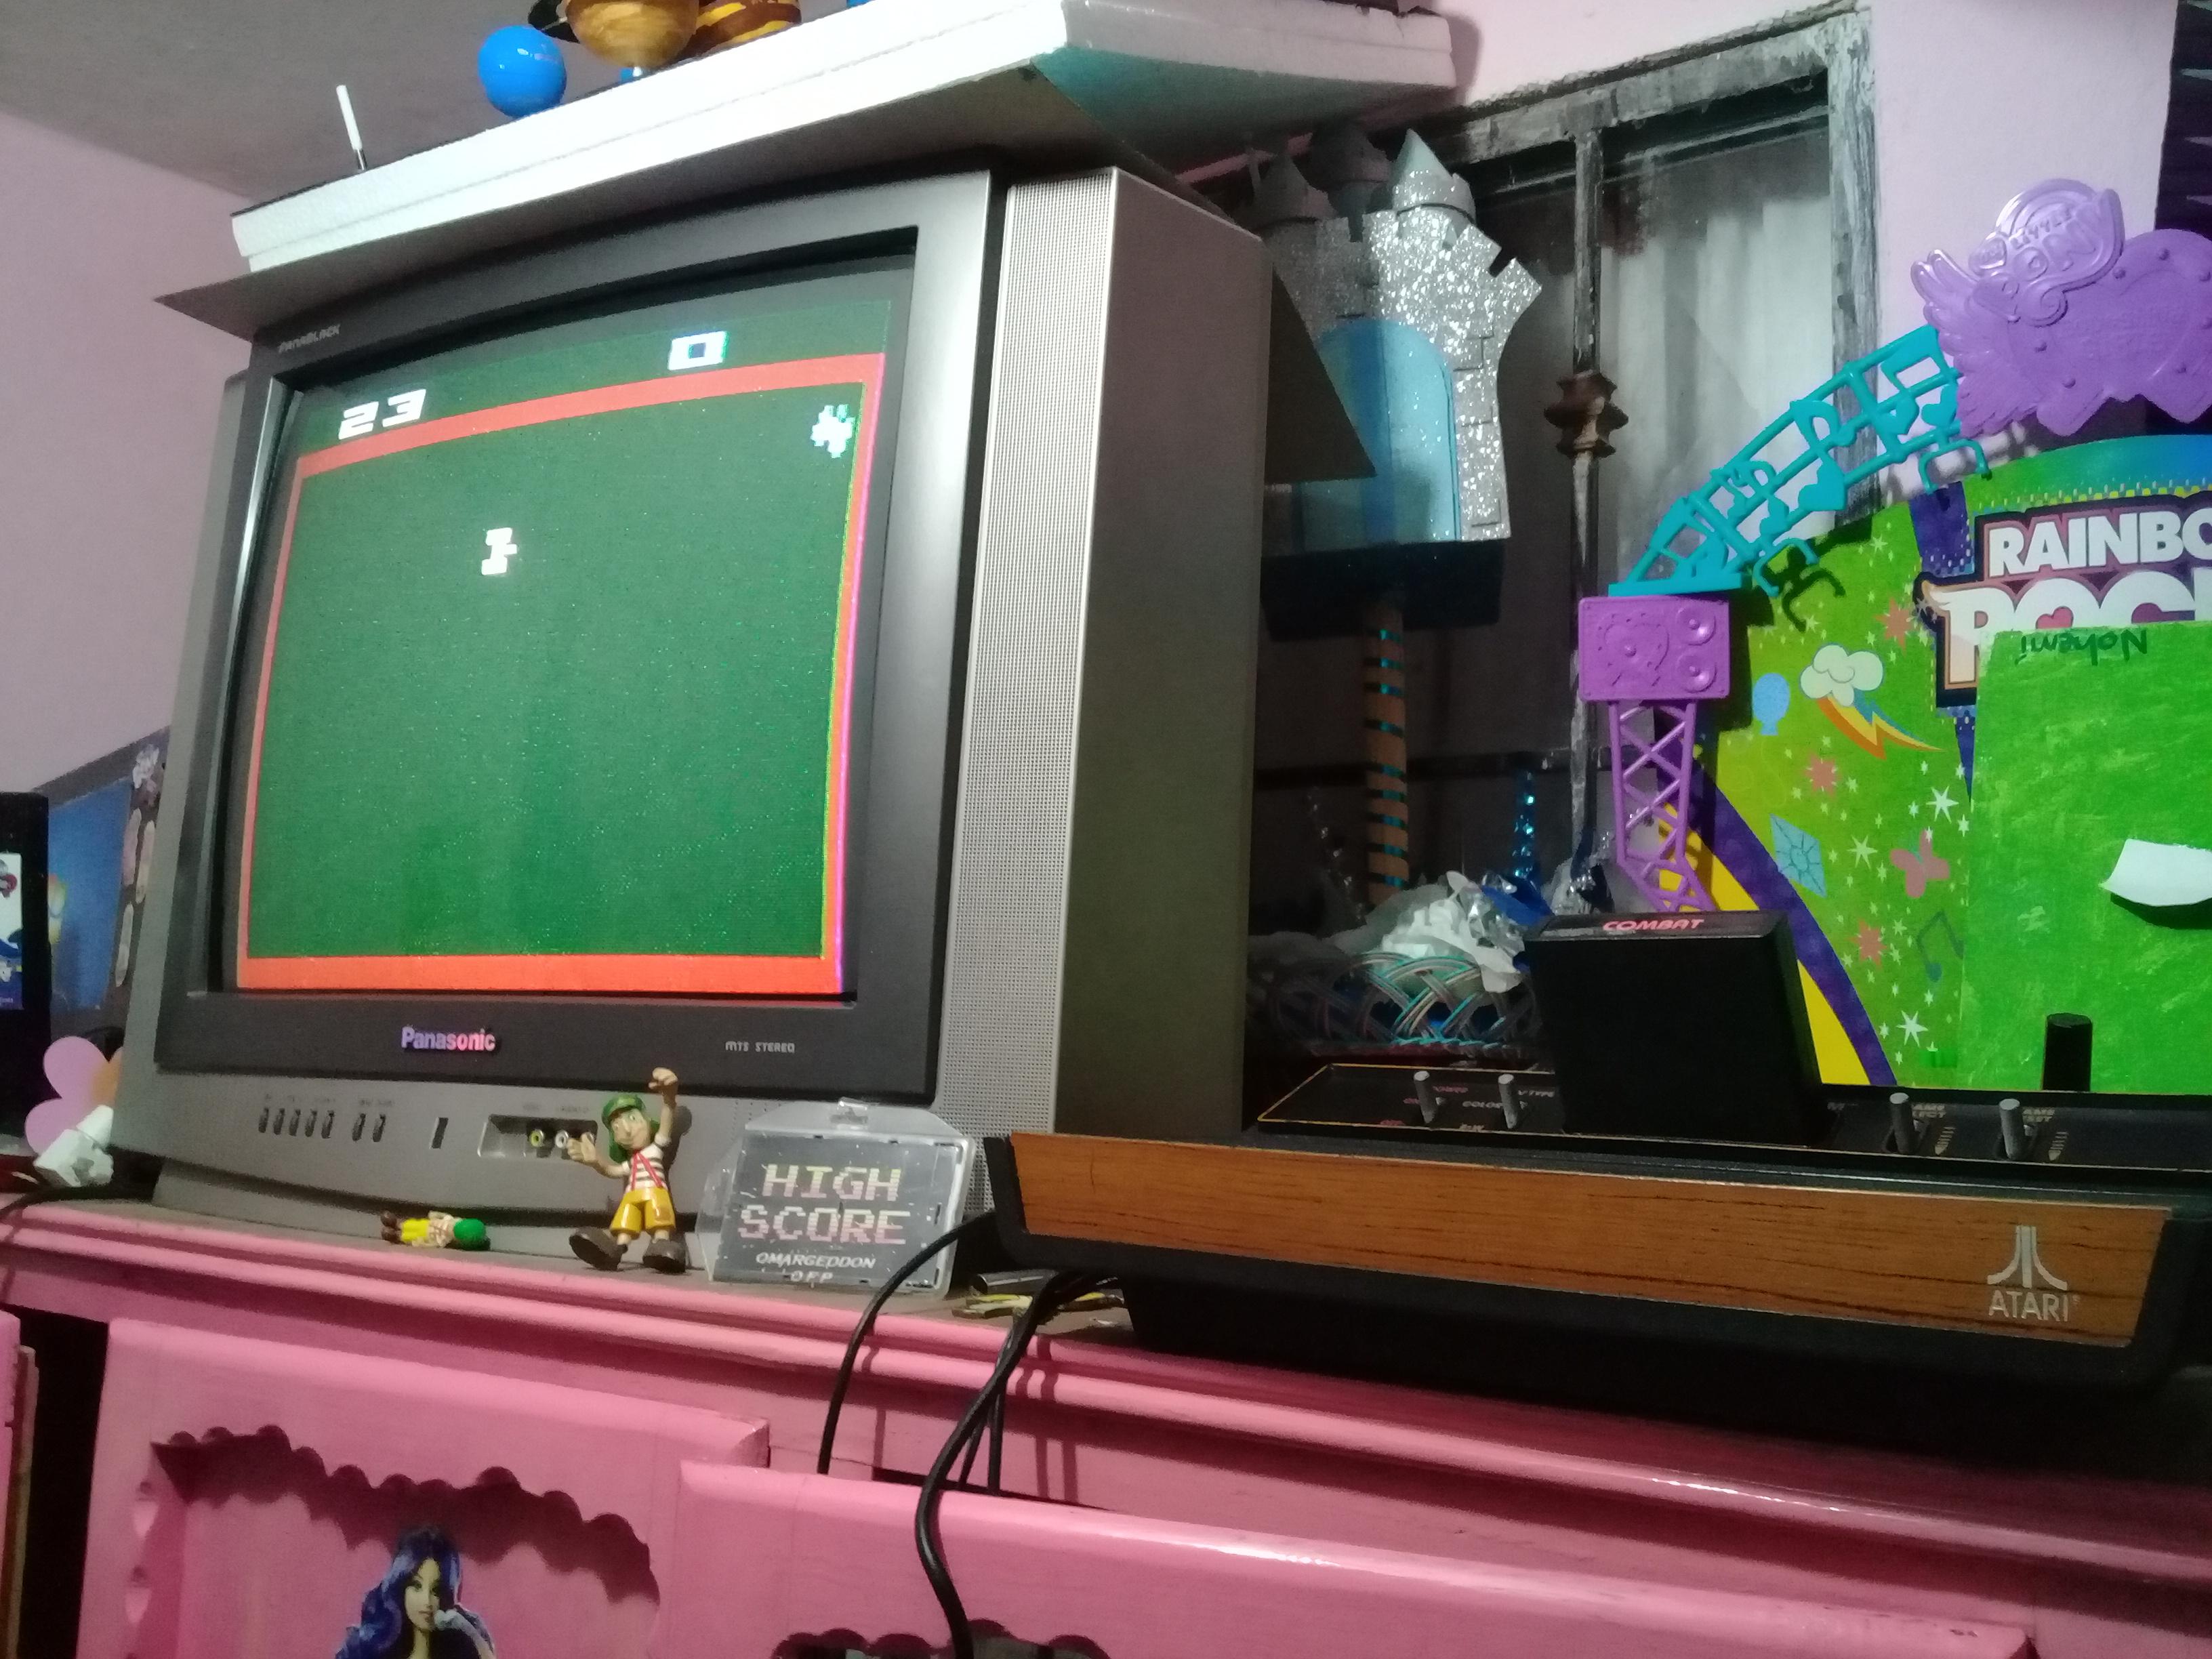 omargeddon: Combat: Game 1 (Atari 2600 Novice/B) 23 points on 2019-01-07 20:56:49